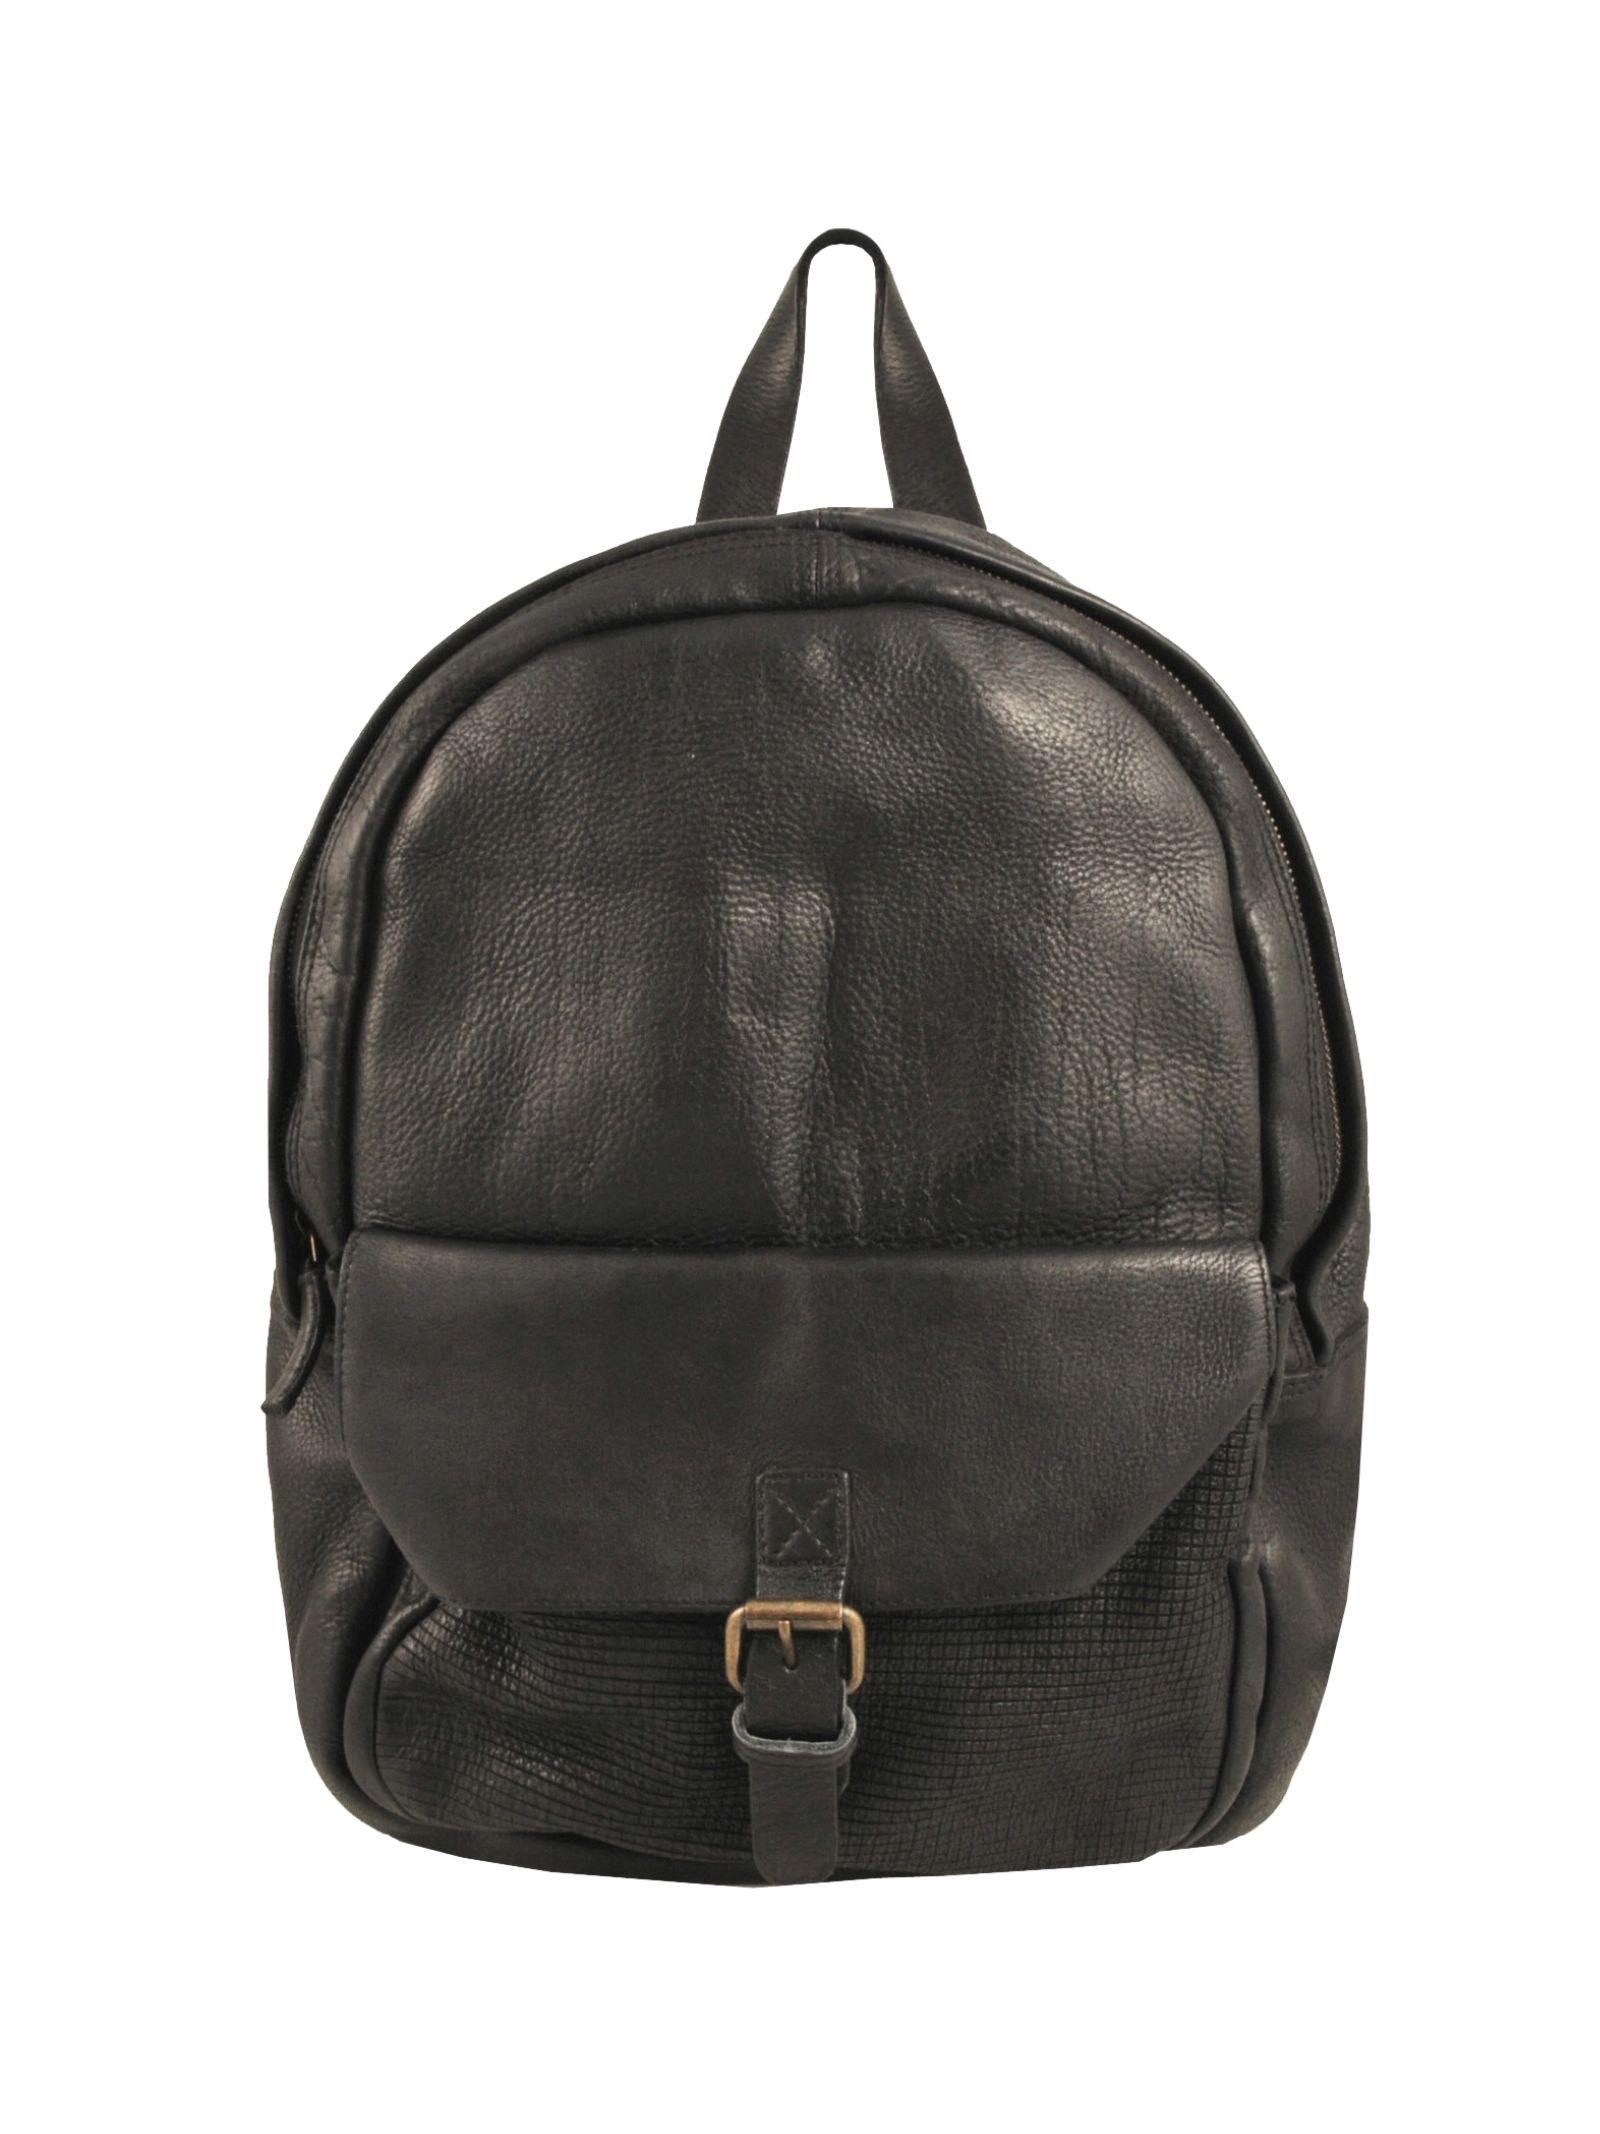 PC Backpack Man Minoronzoni | Bags and backpacks | MRF194B113C99